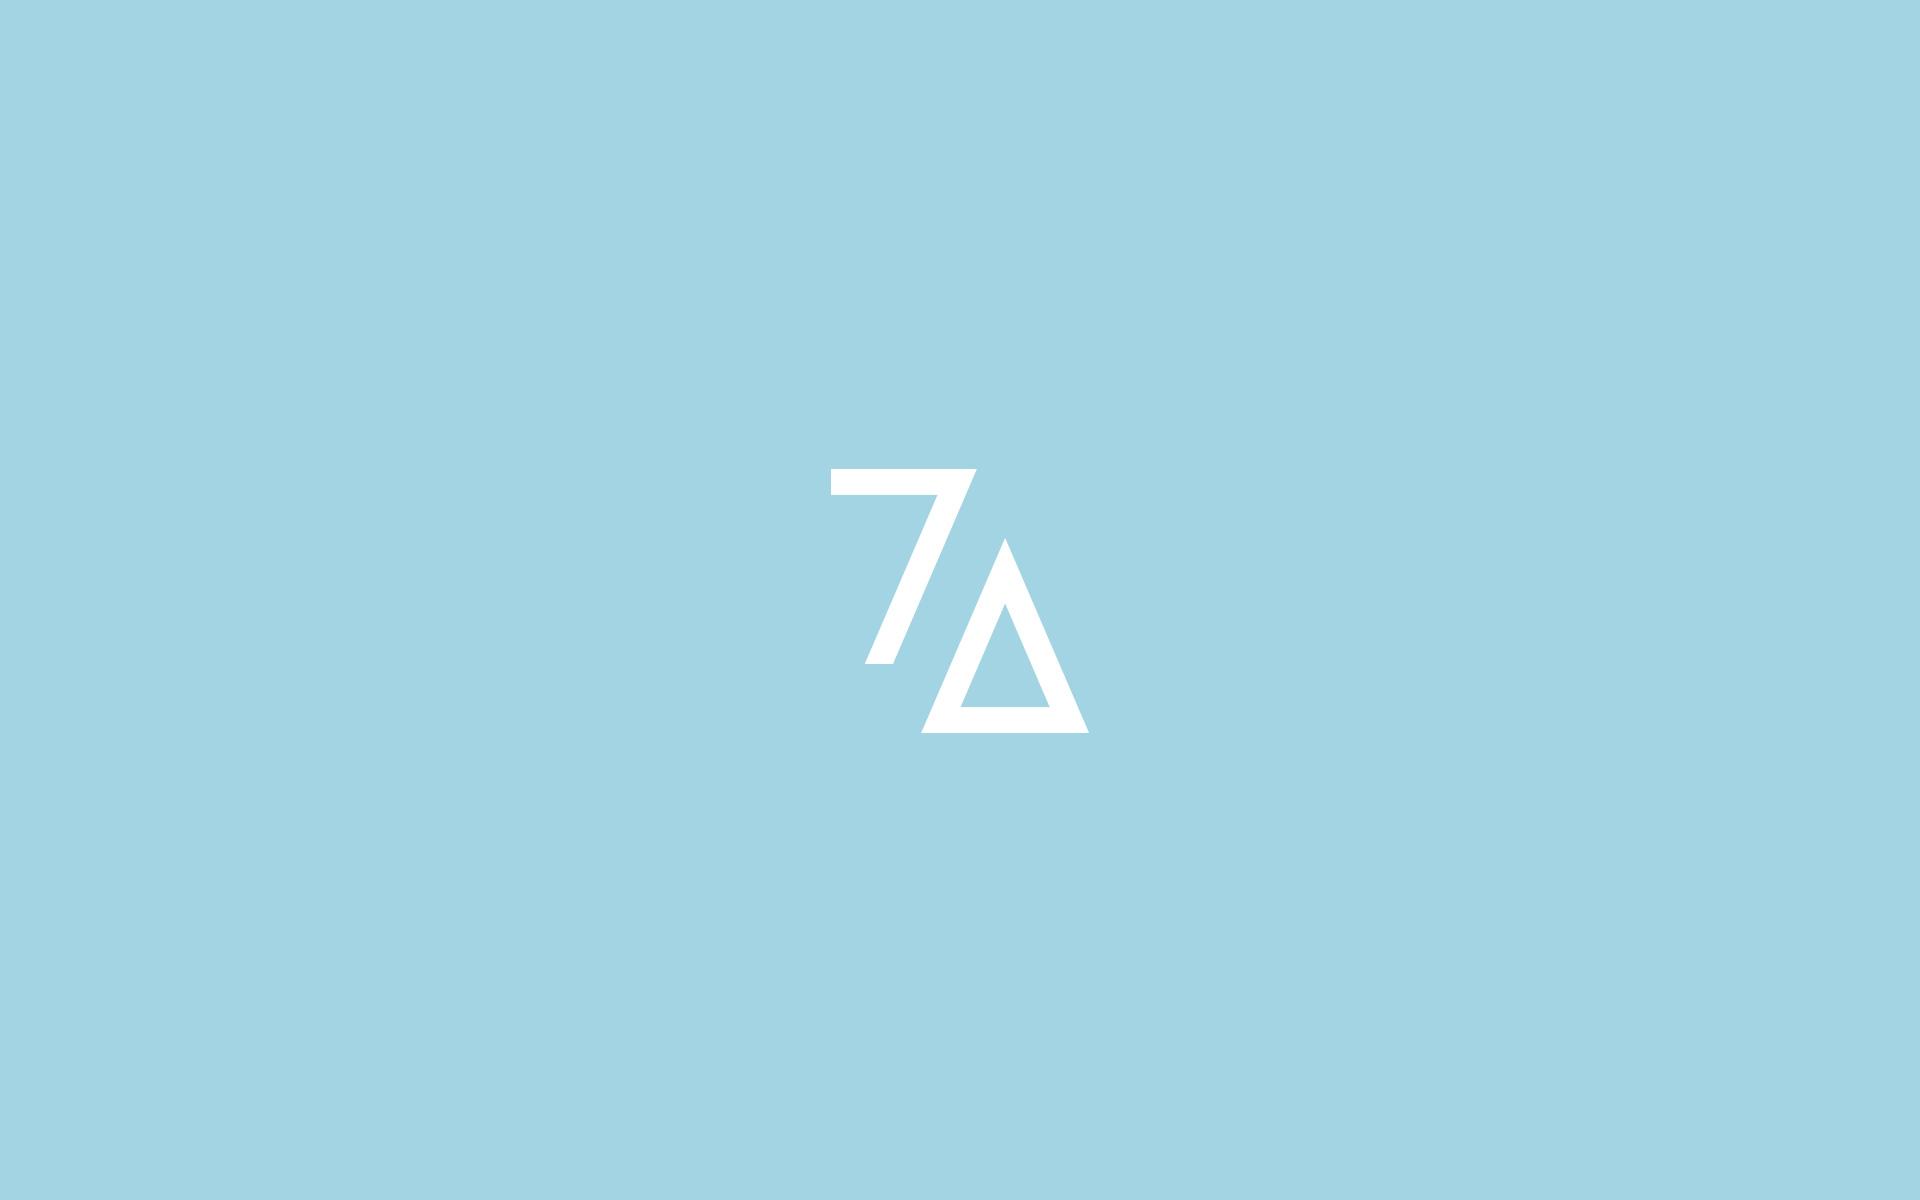 helene-chataigner-7p-color-logo-onblue